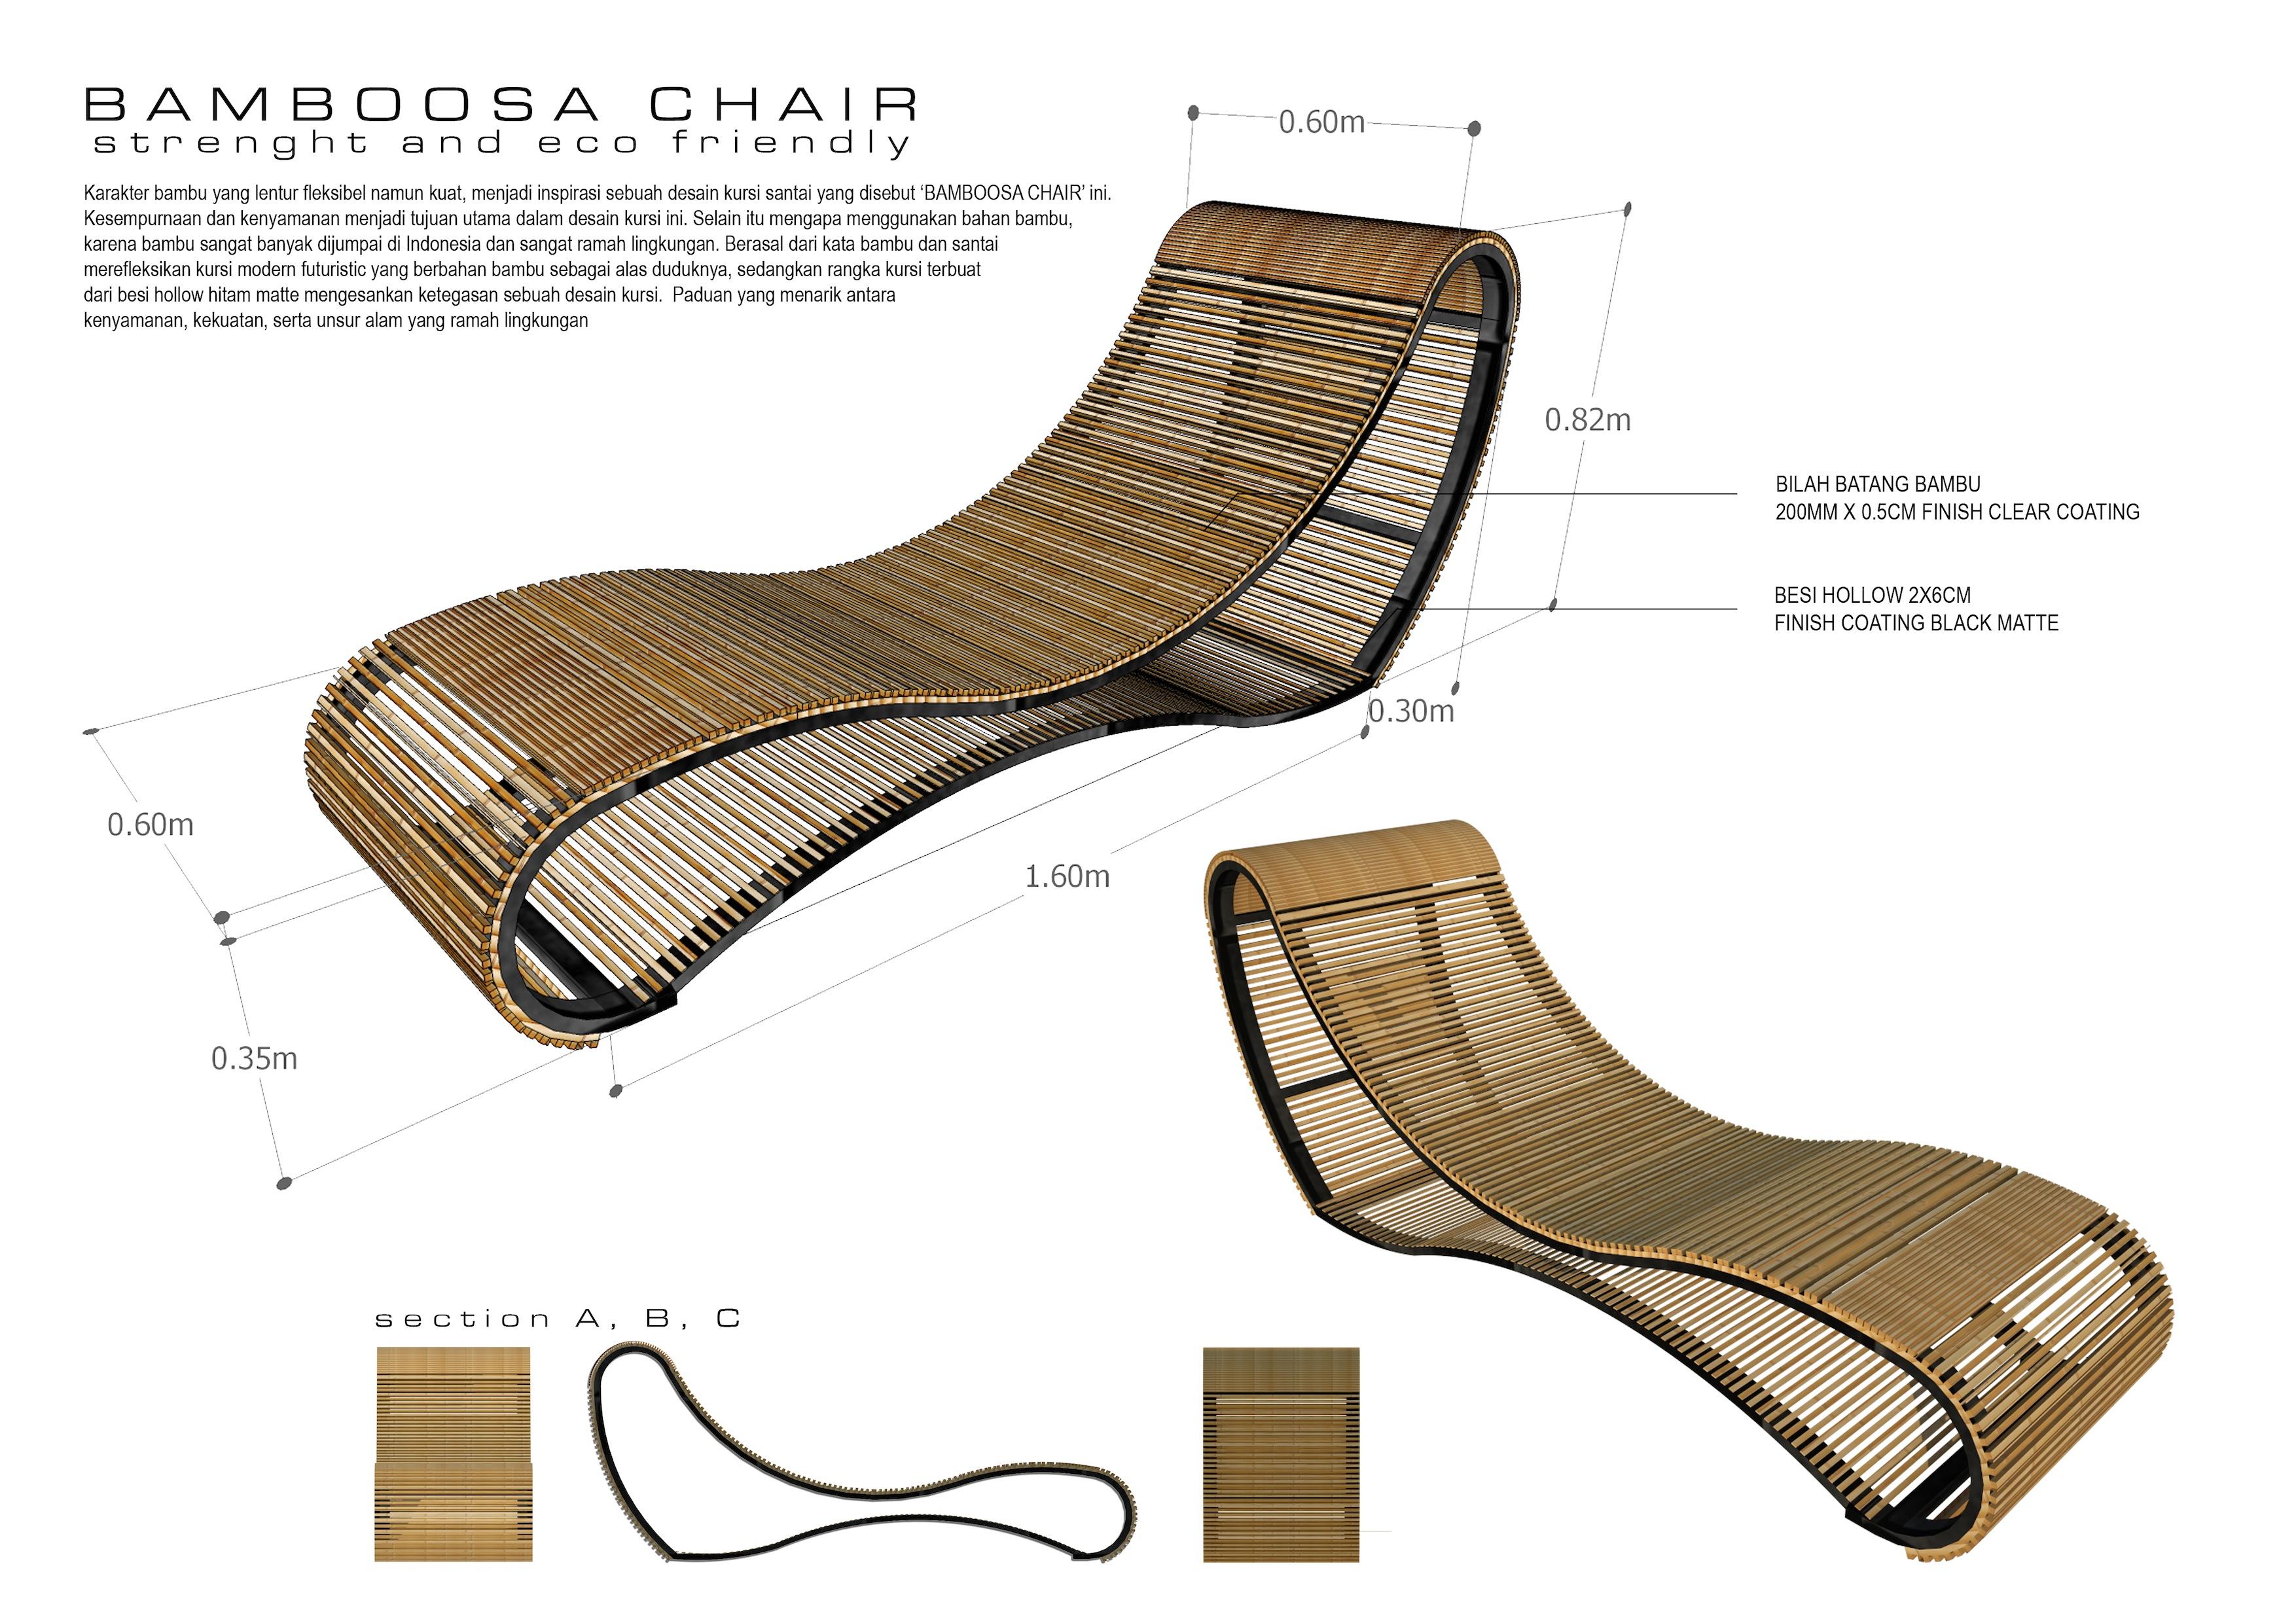 Bamboosa Chair by Ricko Pradiantoro at Coroflot